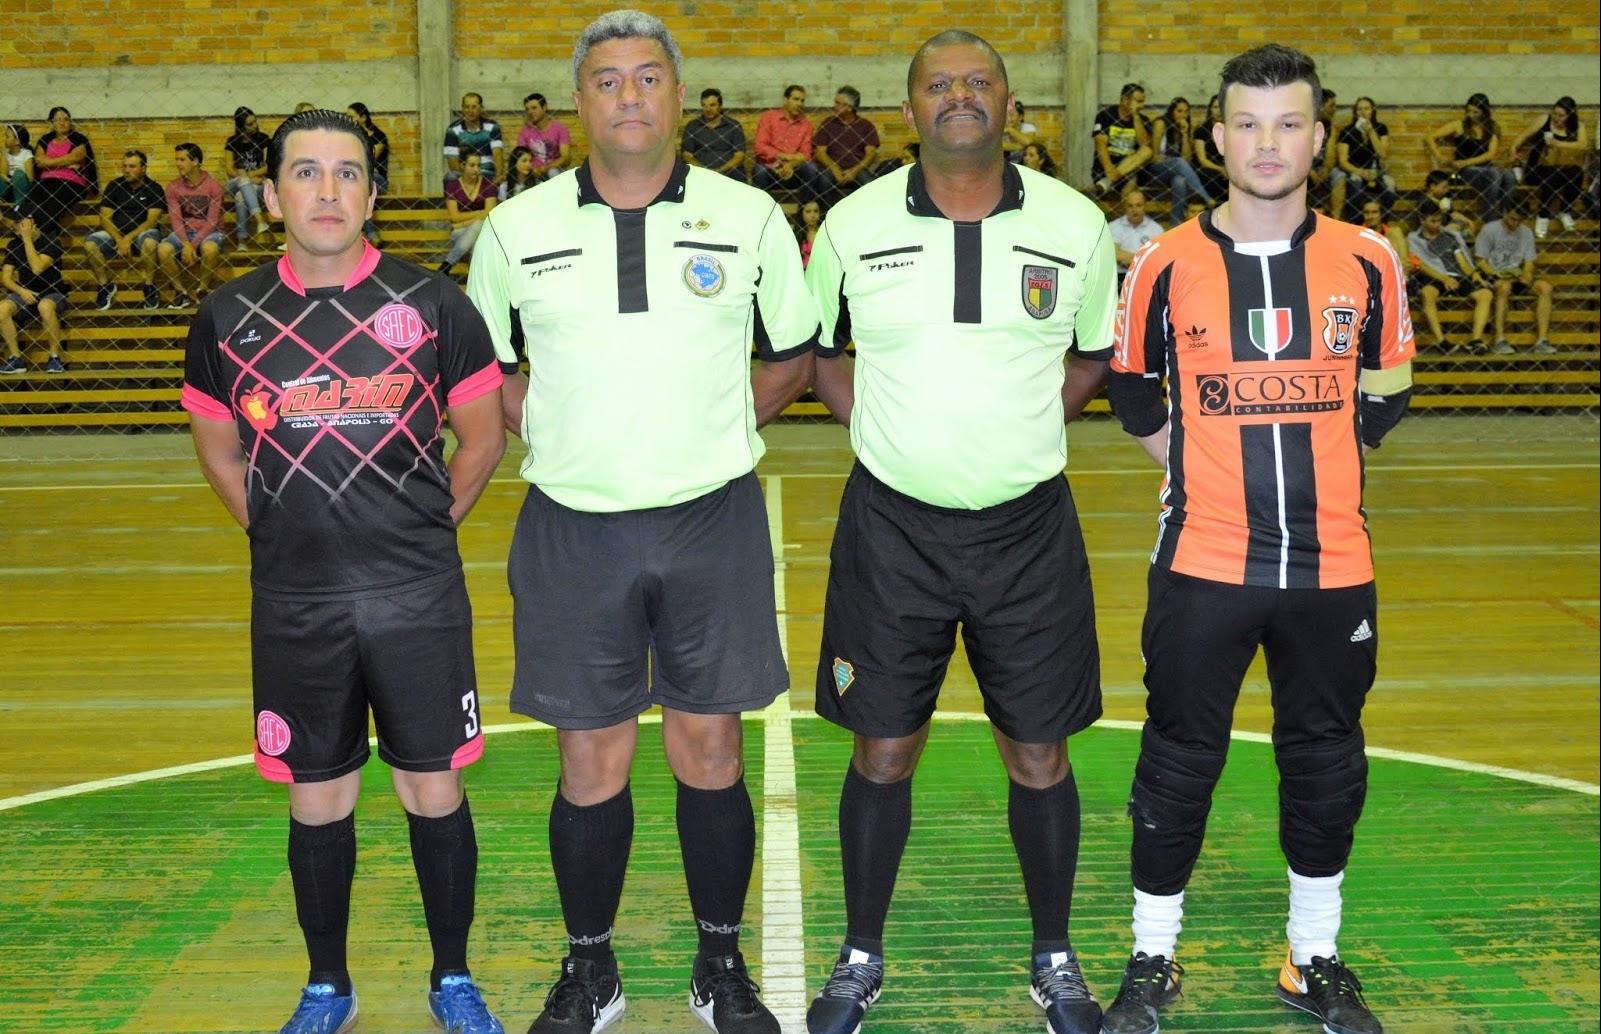 Santo Antônio estreia nesta quinta-feira na Copa Vales da Serra de Futsal